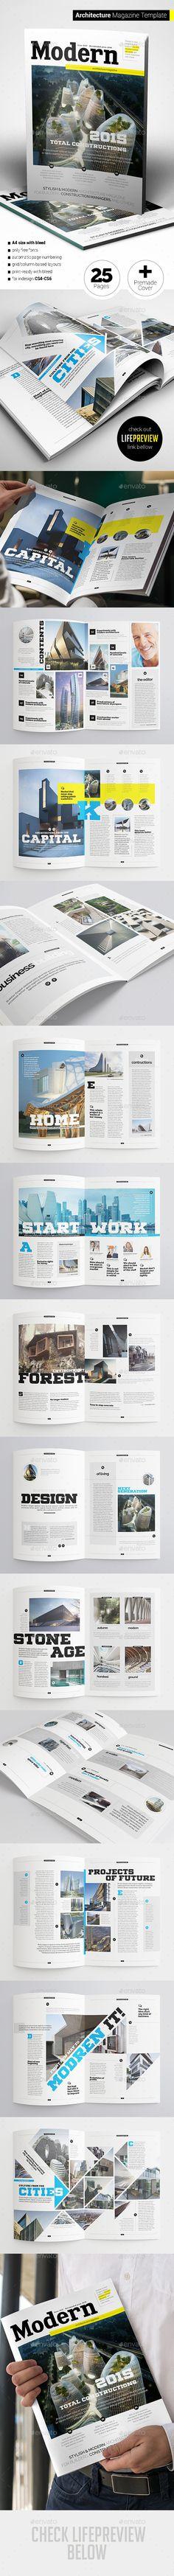 Architecture Magazine Template InDesign INDD #design Download: http://graphicriver.net/item/architecture-magazine/13512986?ref=ksioks